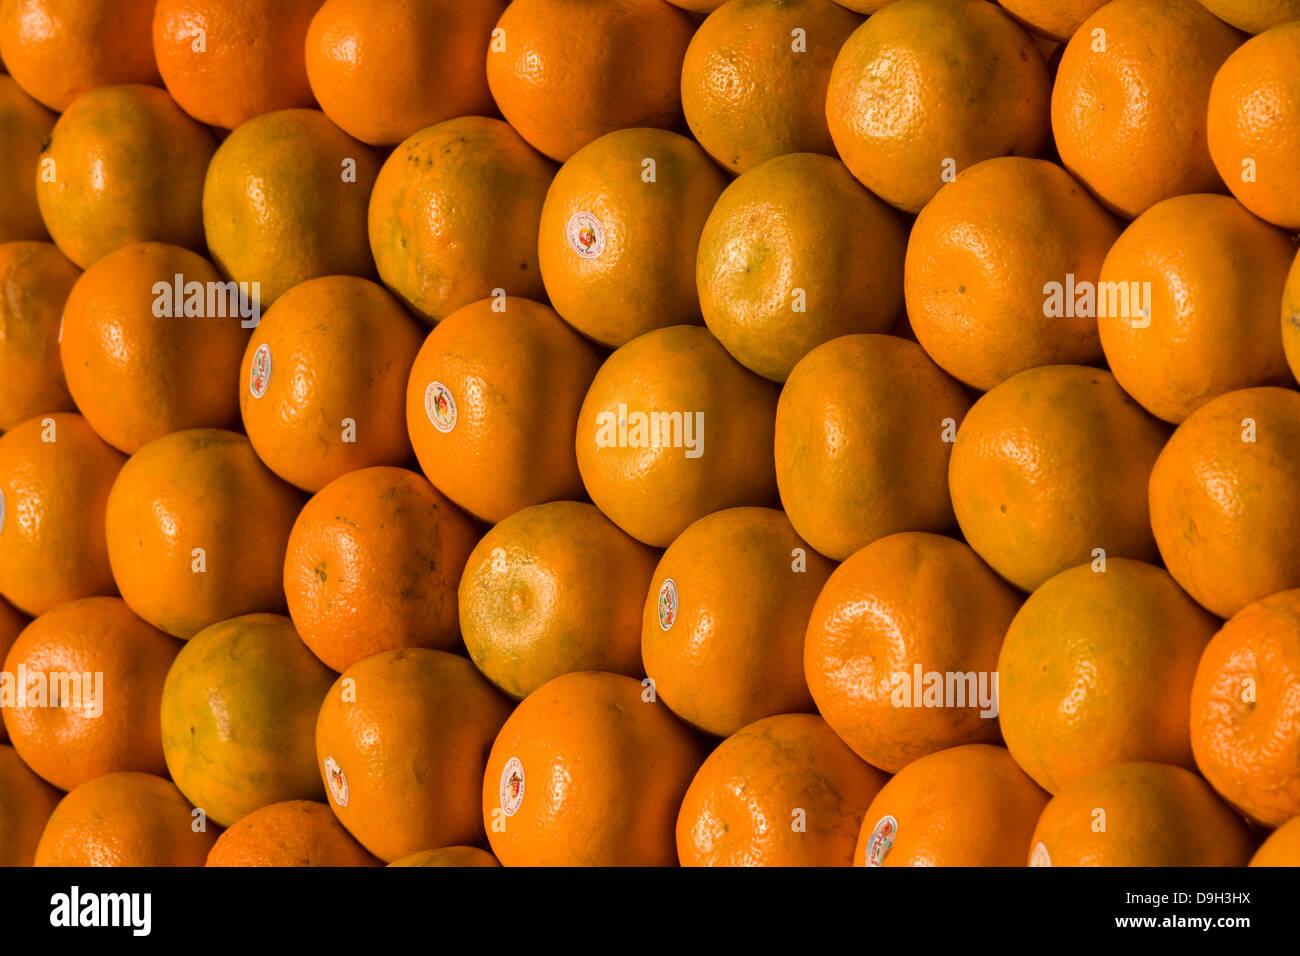 Asien, Indien, Karnataka, Mysore, Mandarinen Stock Photo